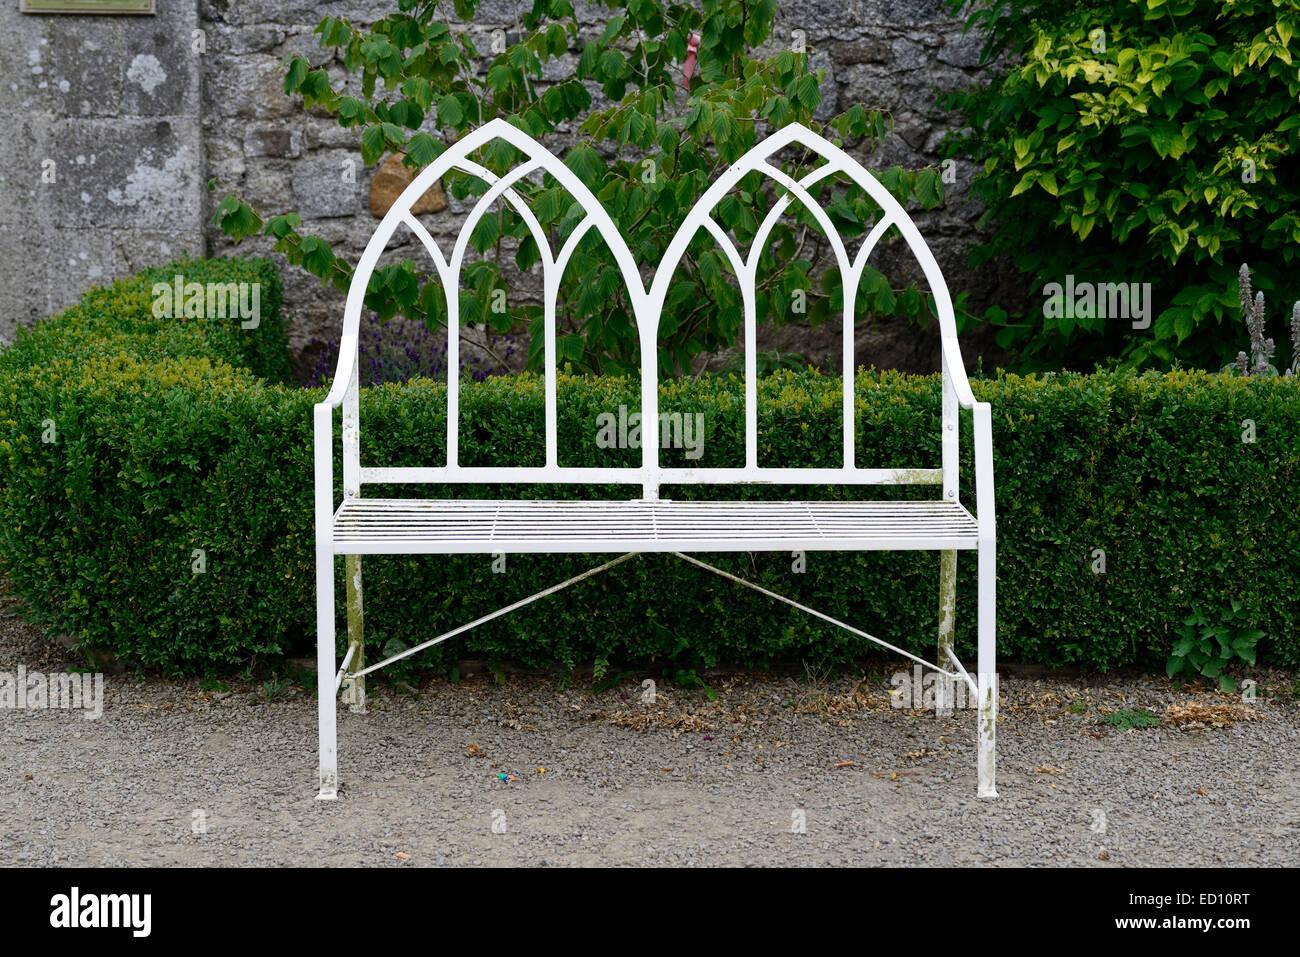 White garden seat seating two seater wrought iron metal bench